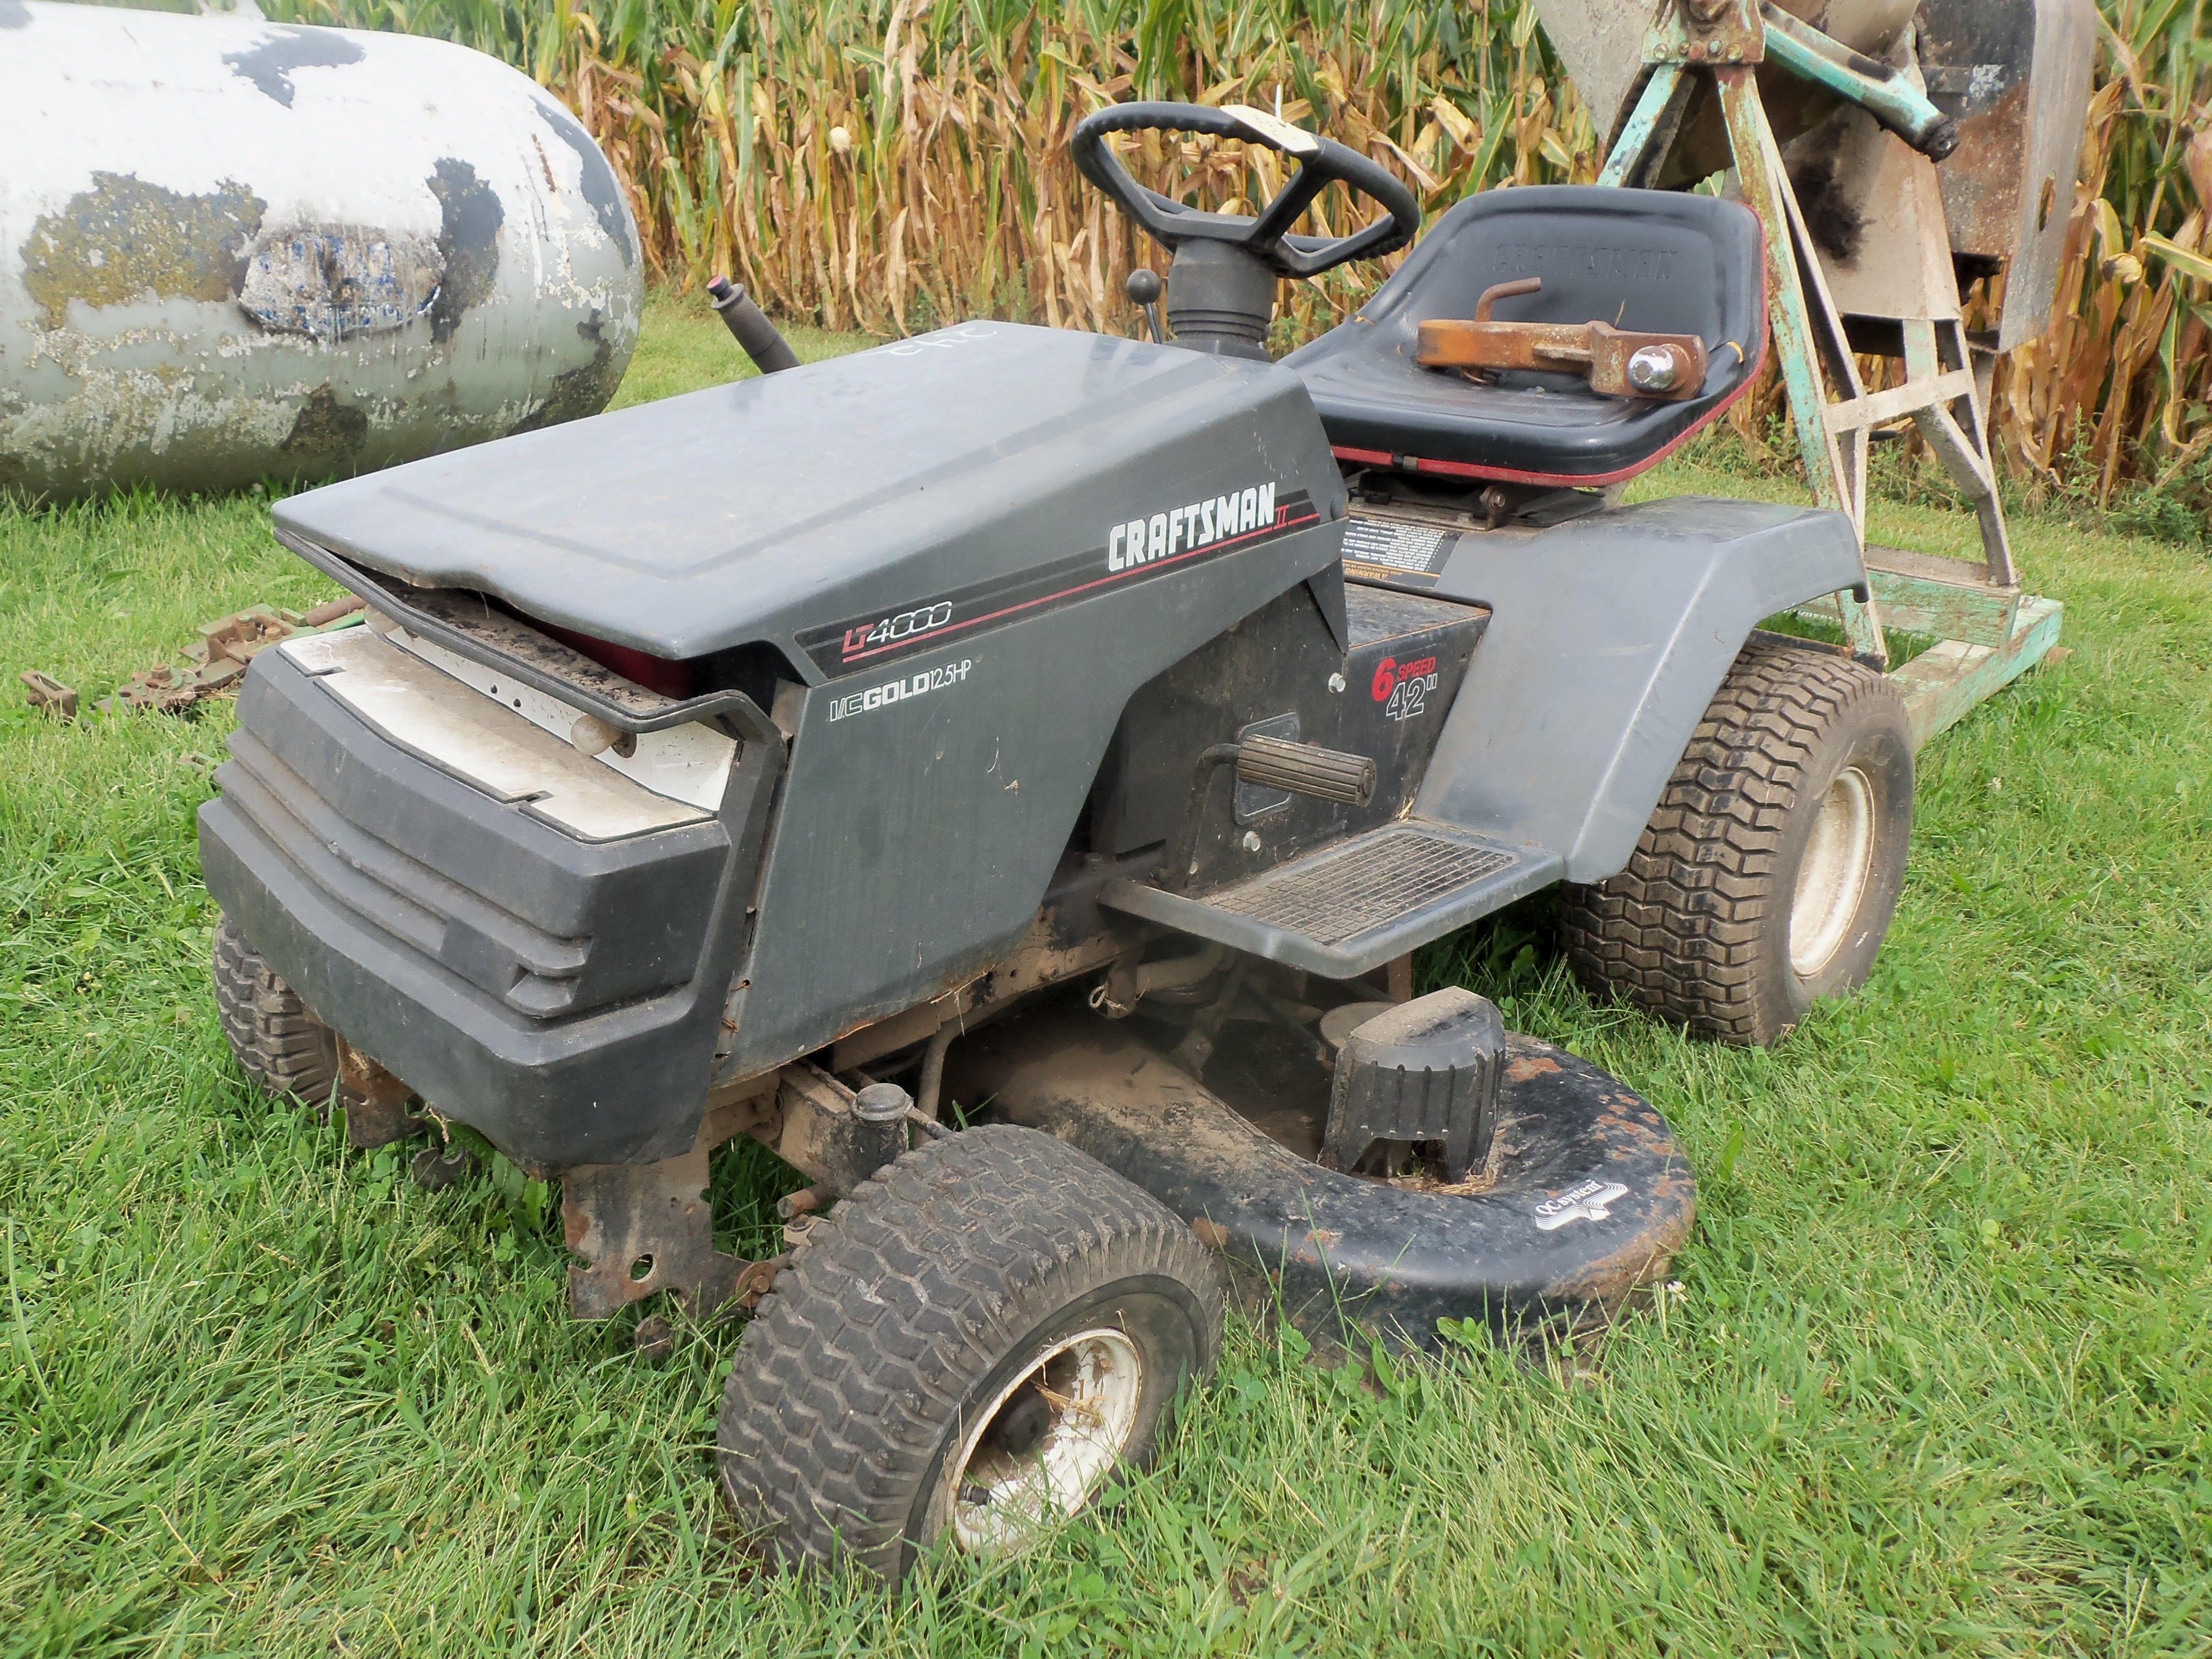 Craftsman Lt4000 12 5hp Lawn Tractor Lawn Tractor Garden Tractor Lawn Mower